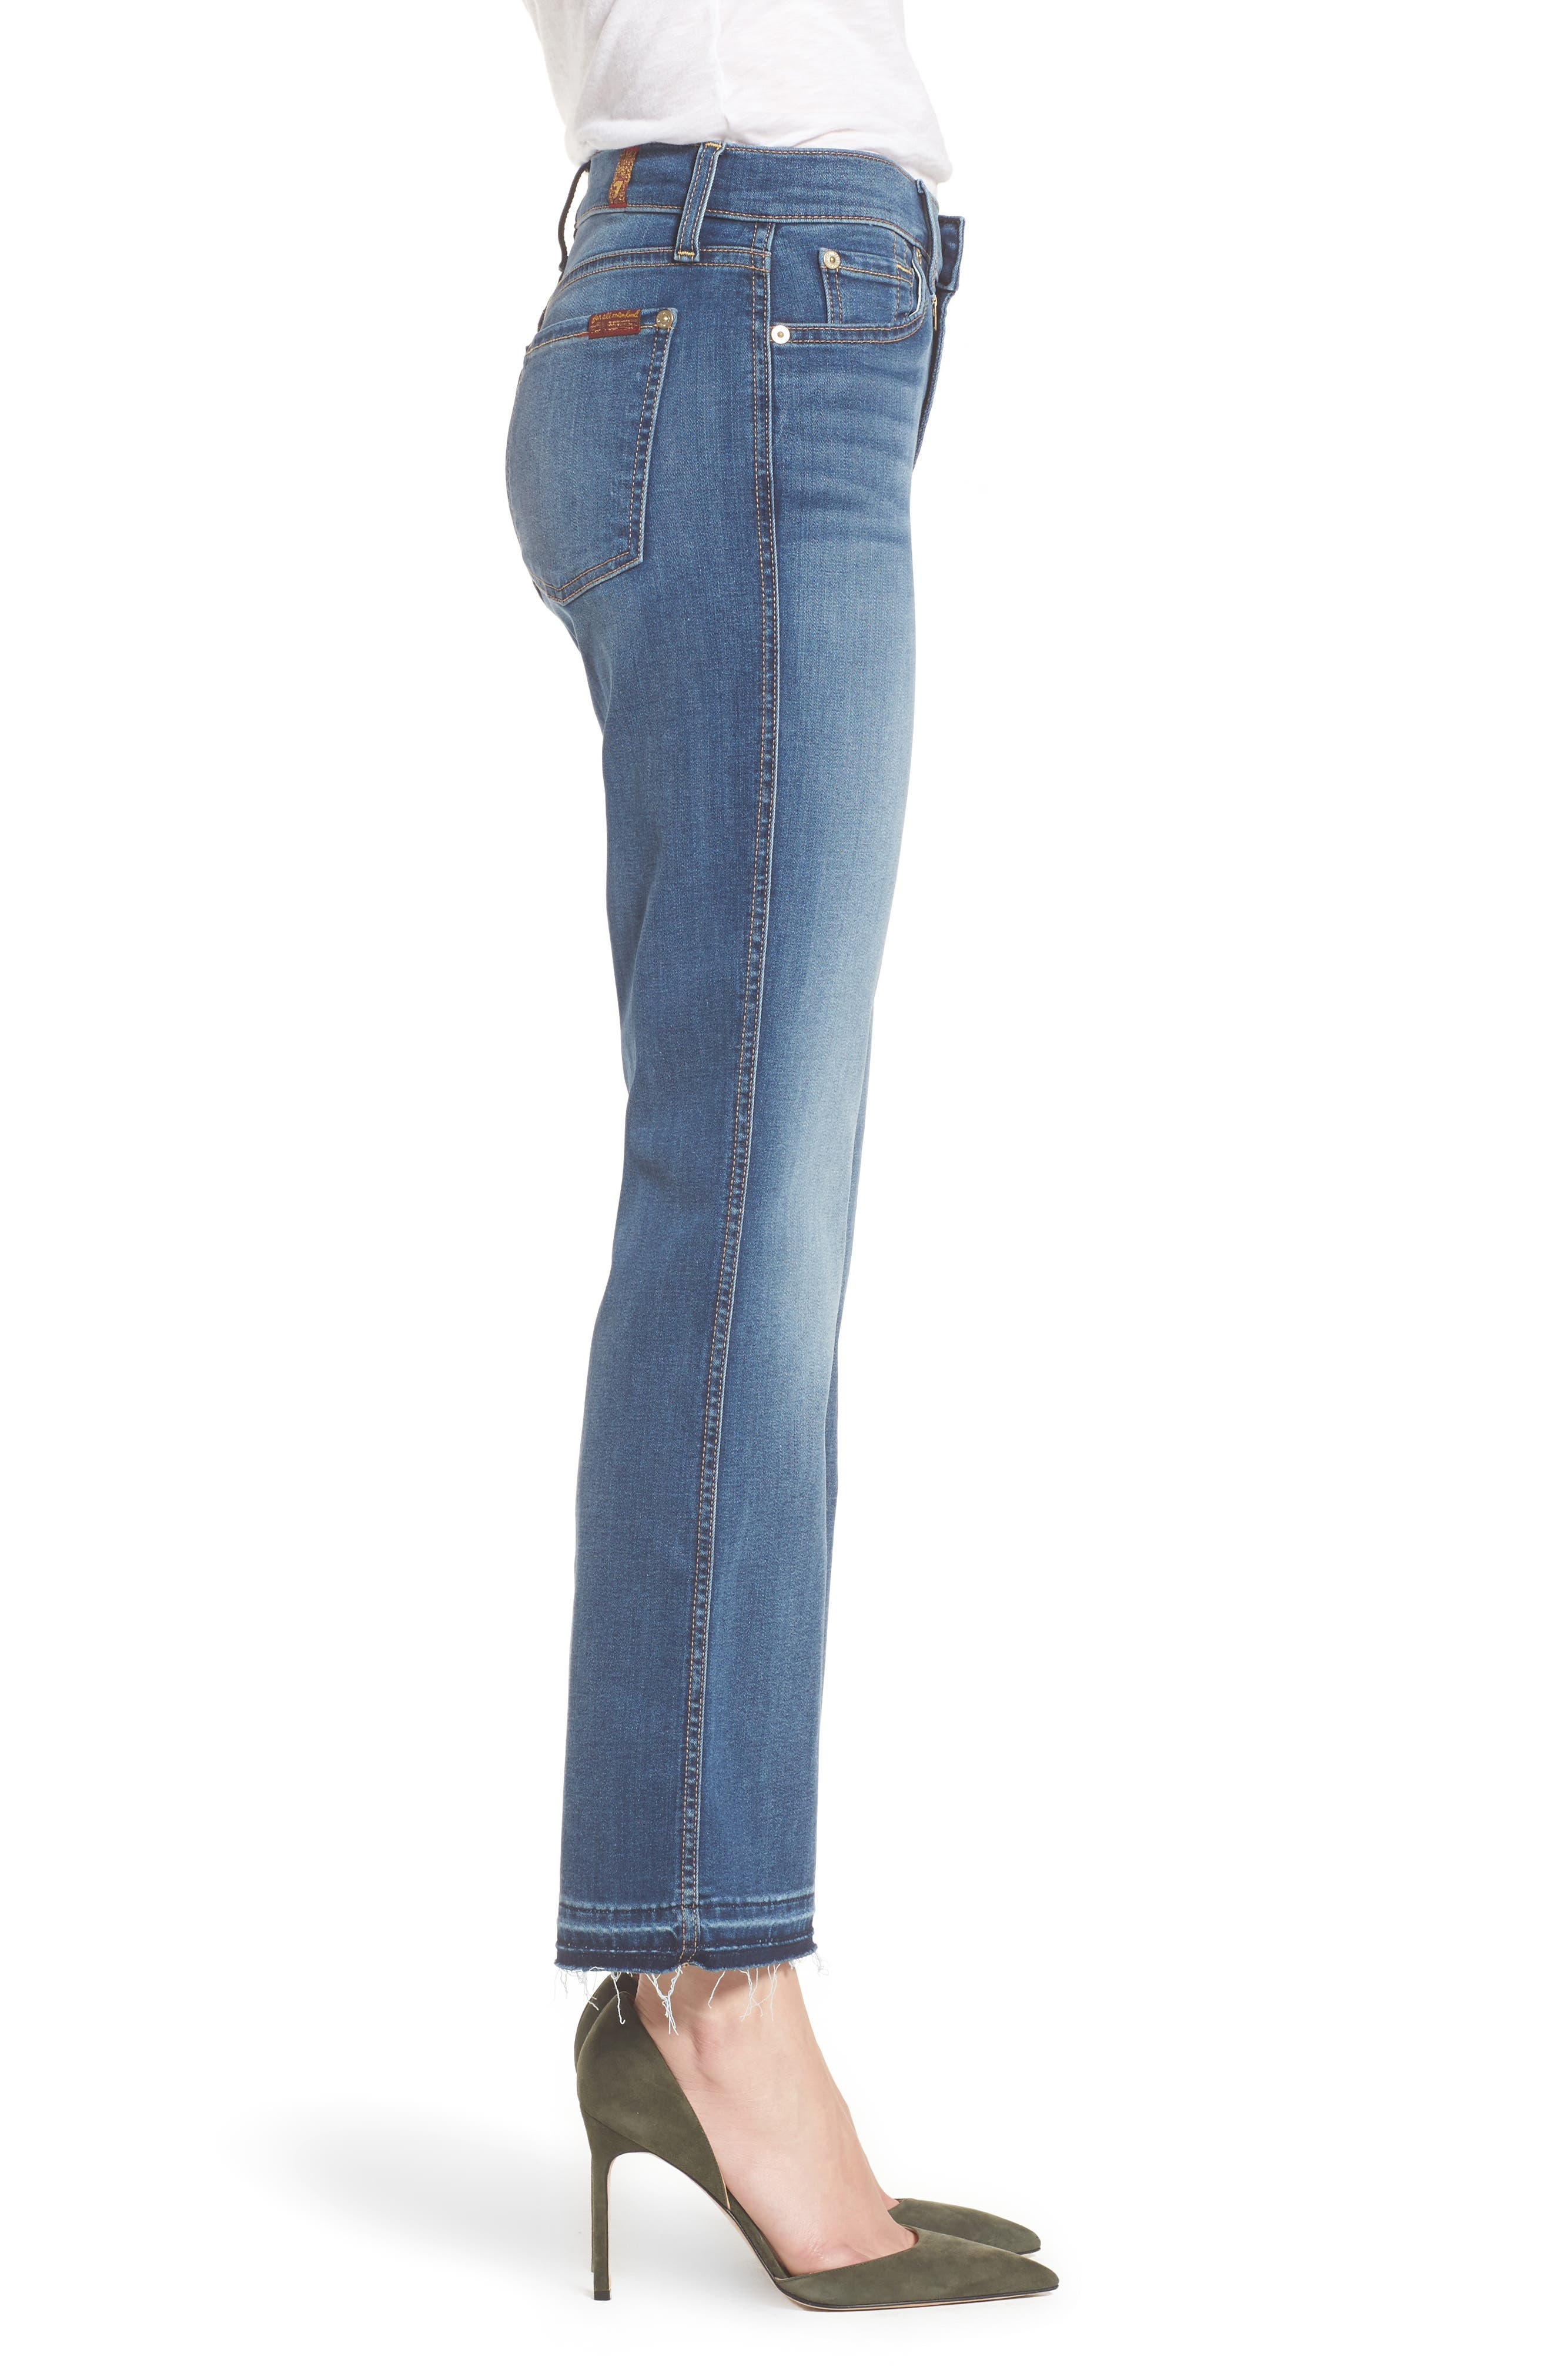 b(air) Crop Bootcut Jeans,                             Alternate thumbnail 3, color,                             BAIR VINTAGE DUSK